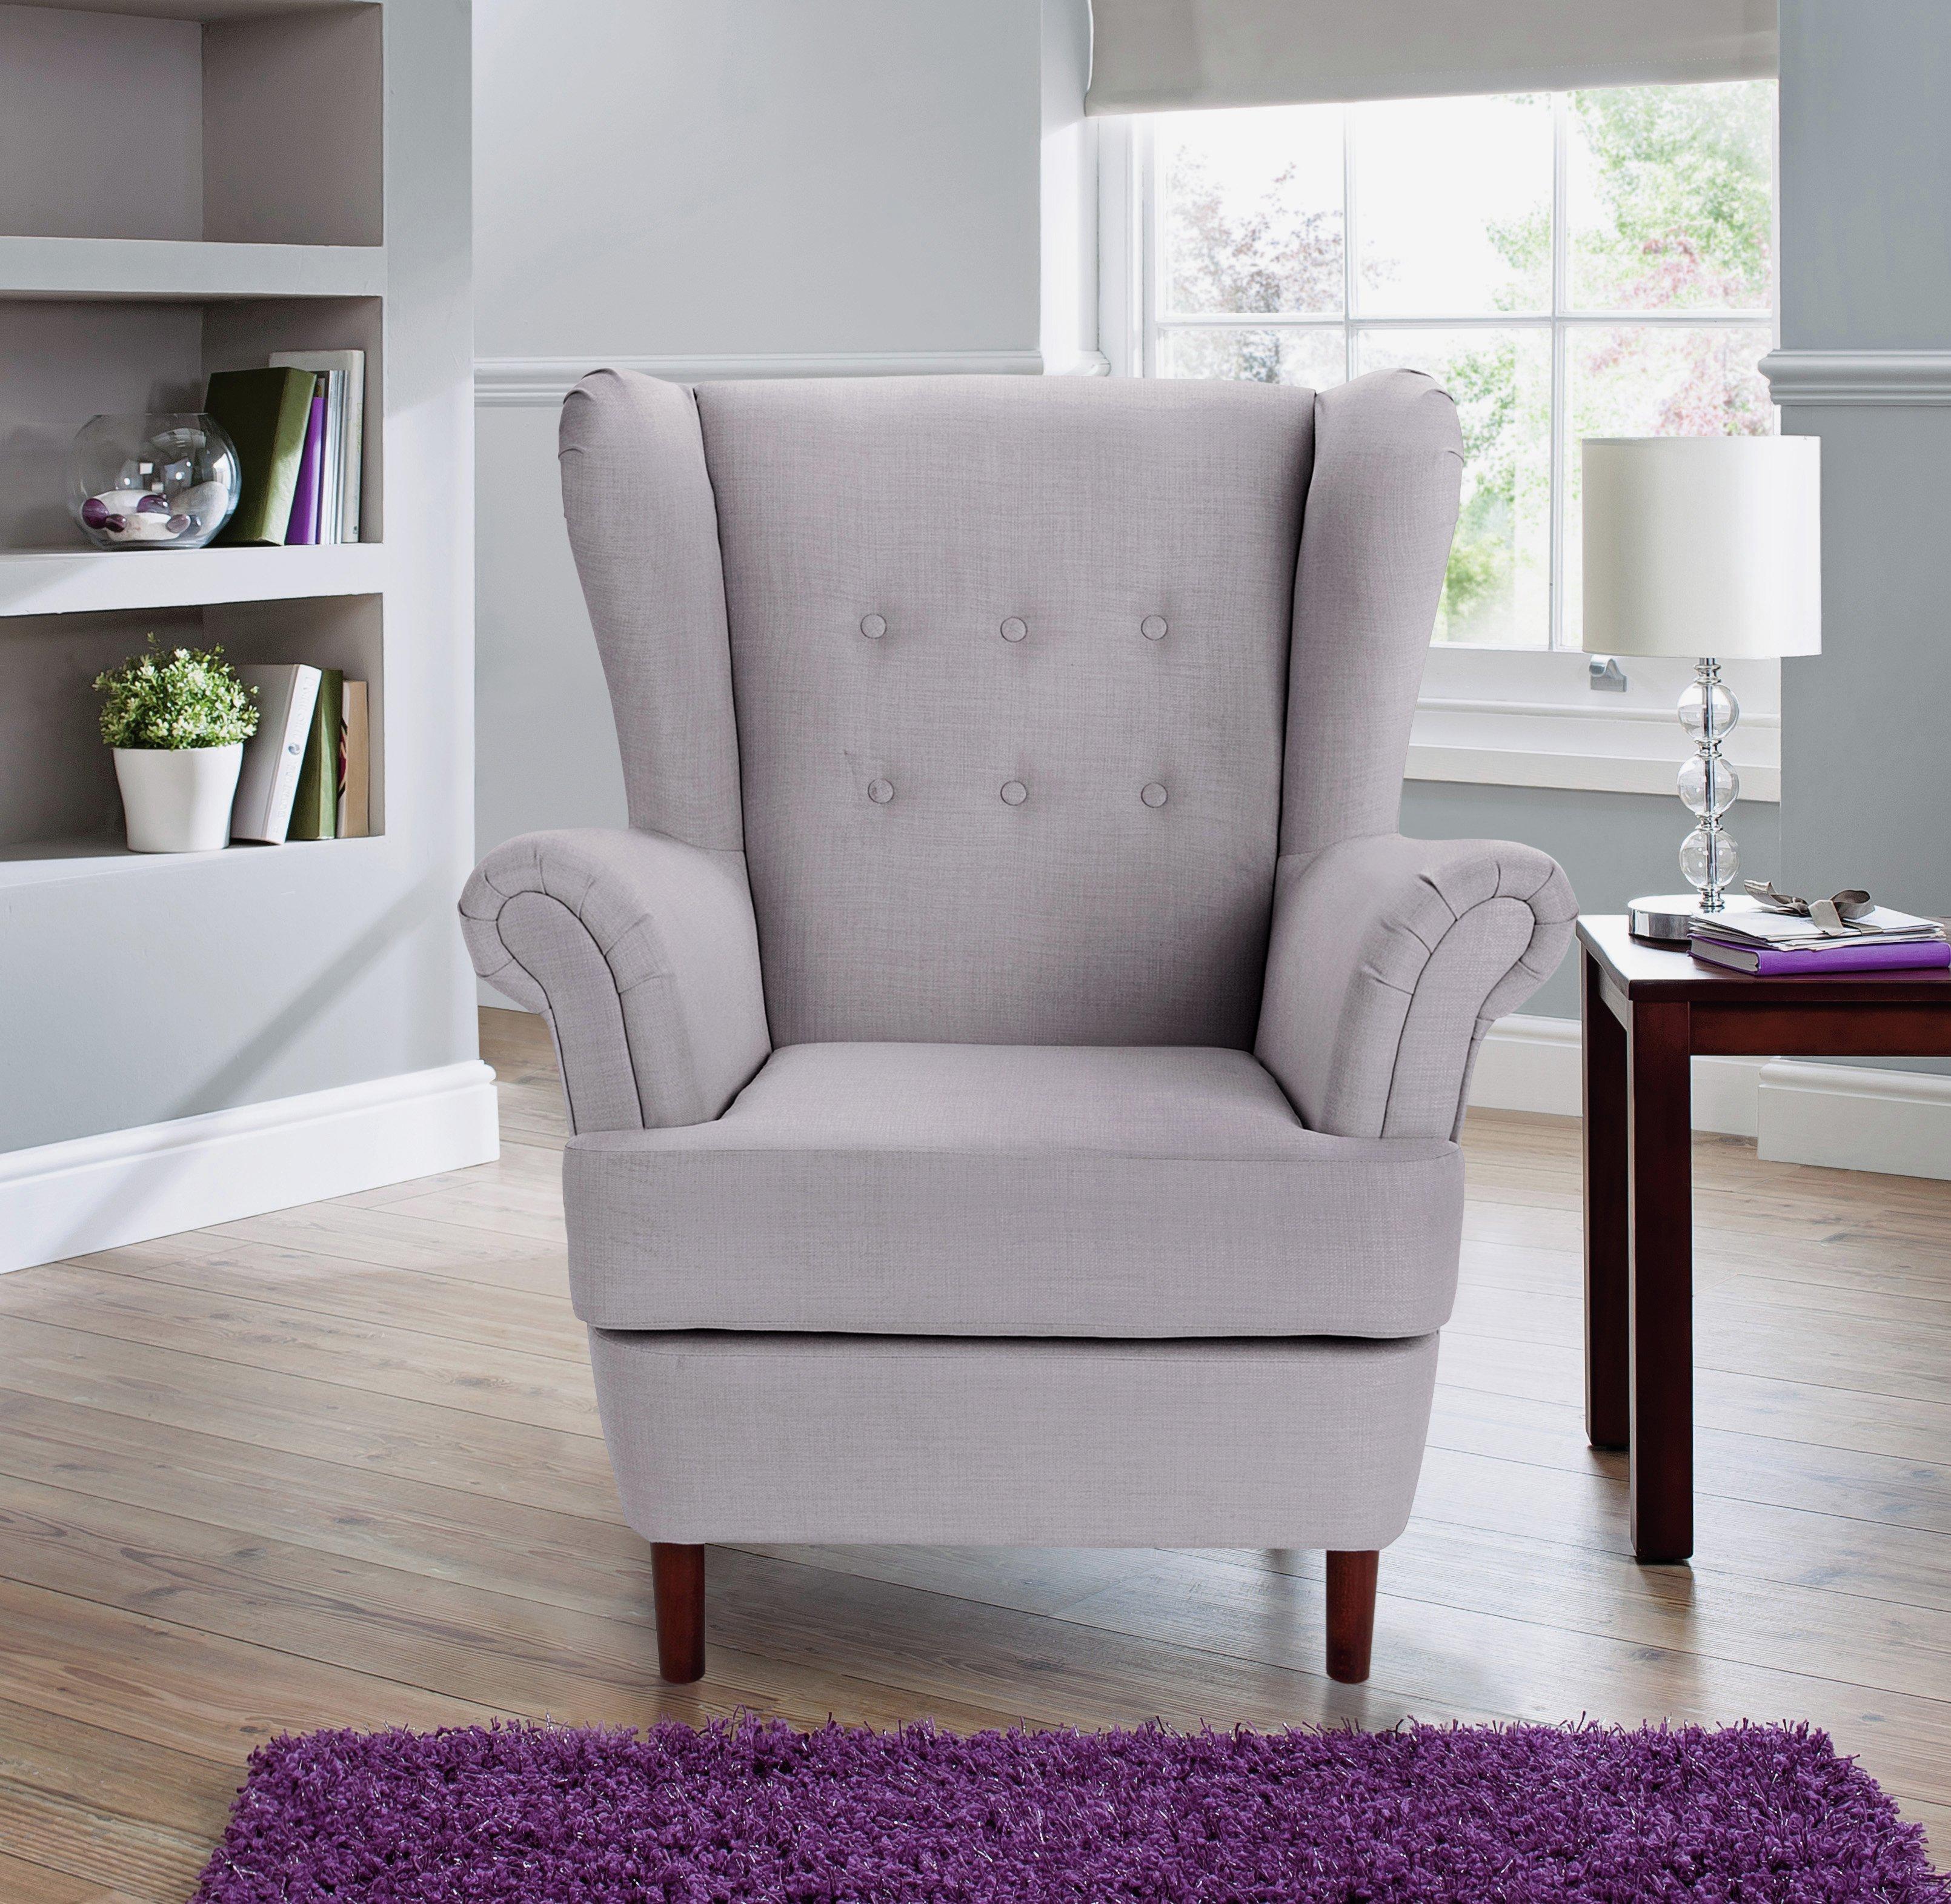 Argos Home Martha Fabric Wingback Chair - Light Grey